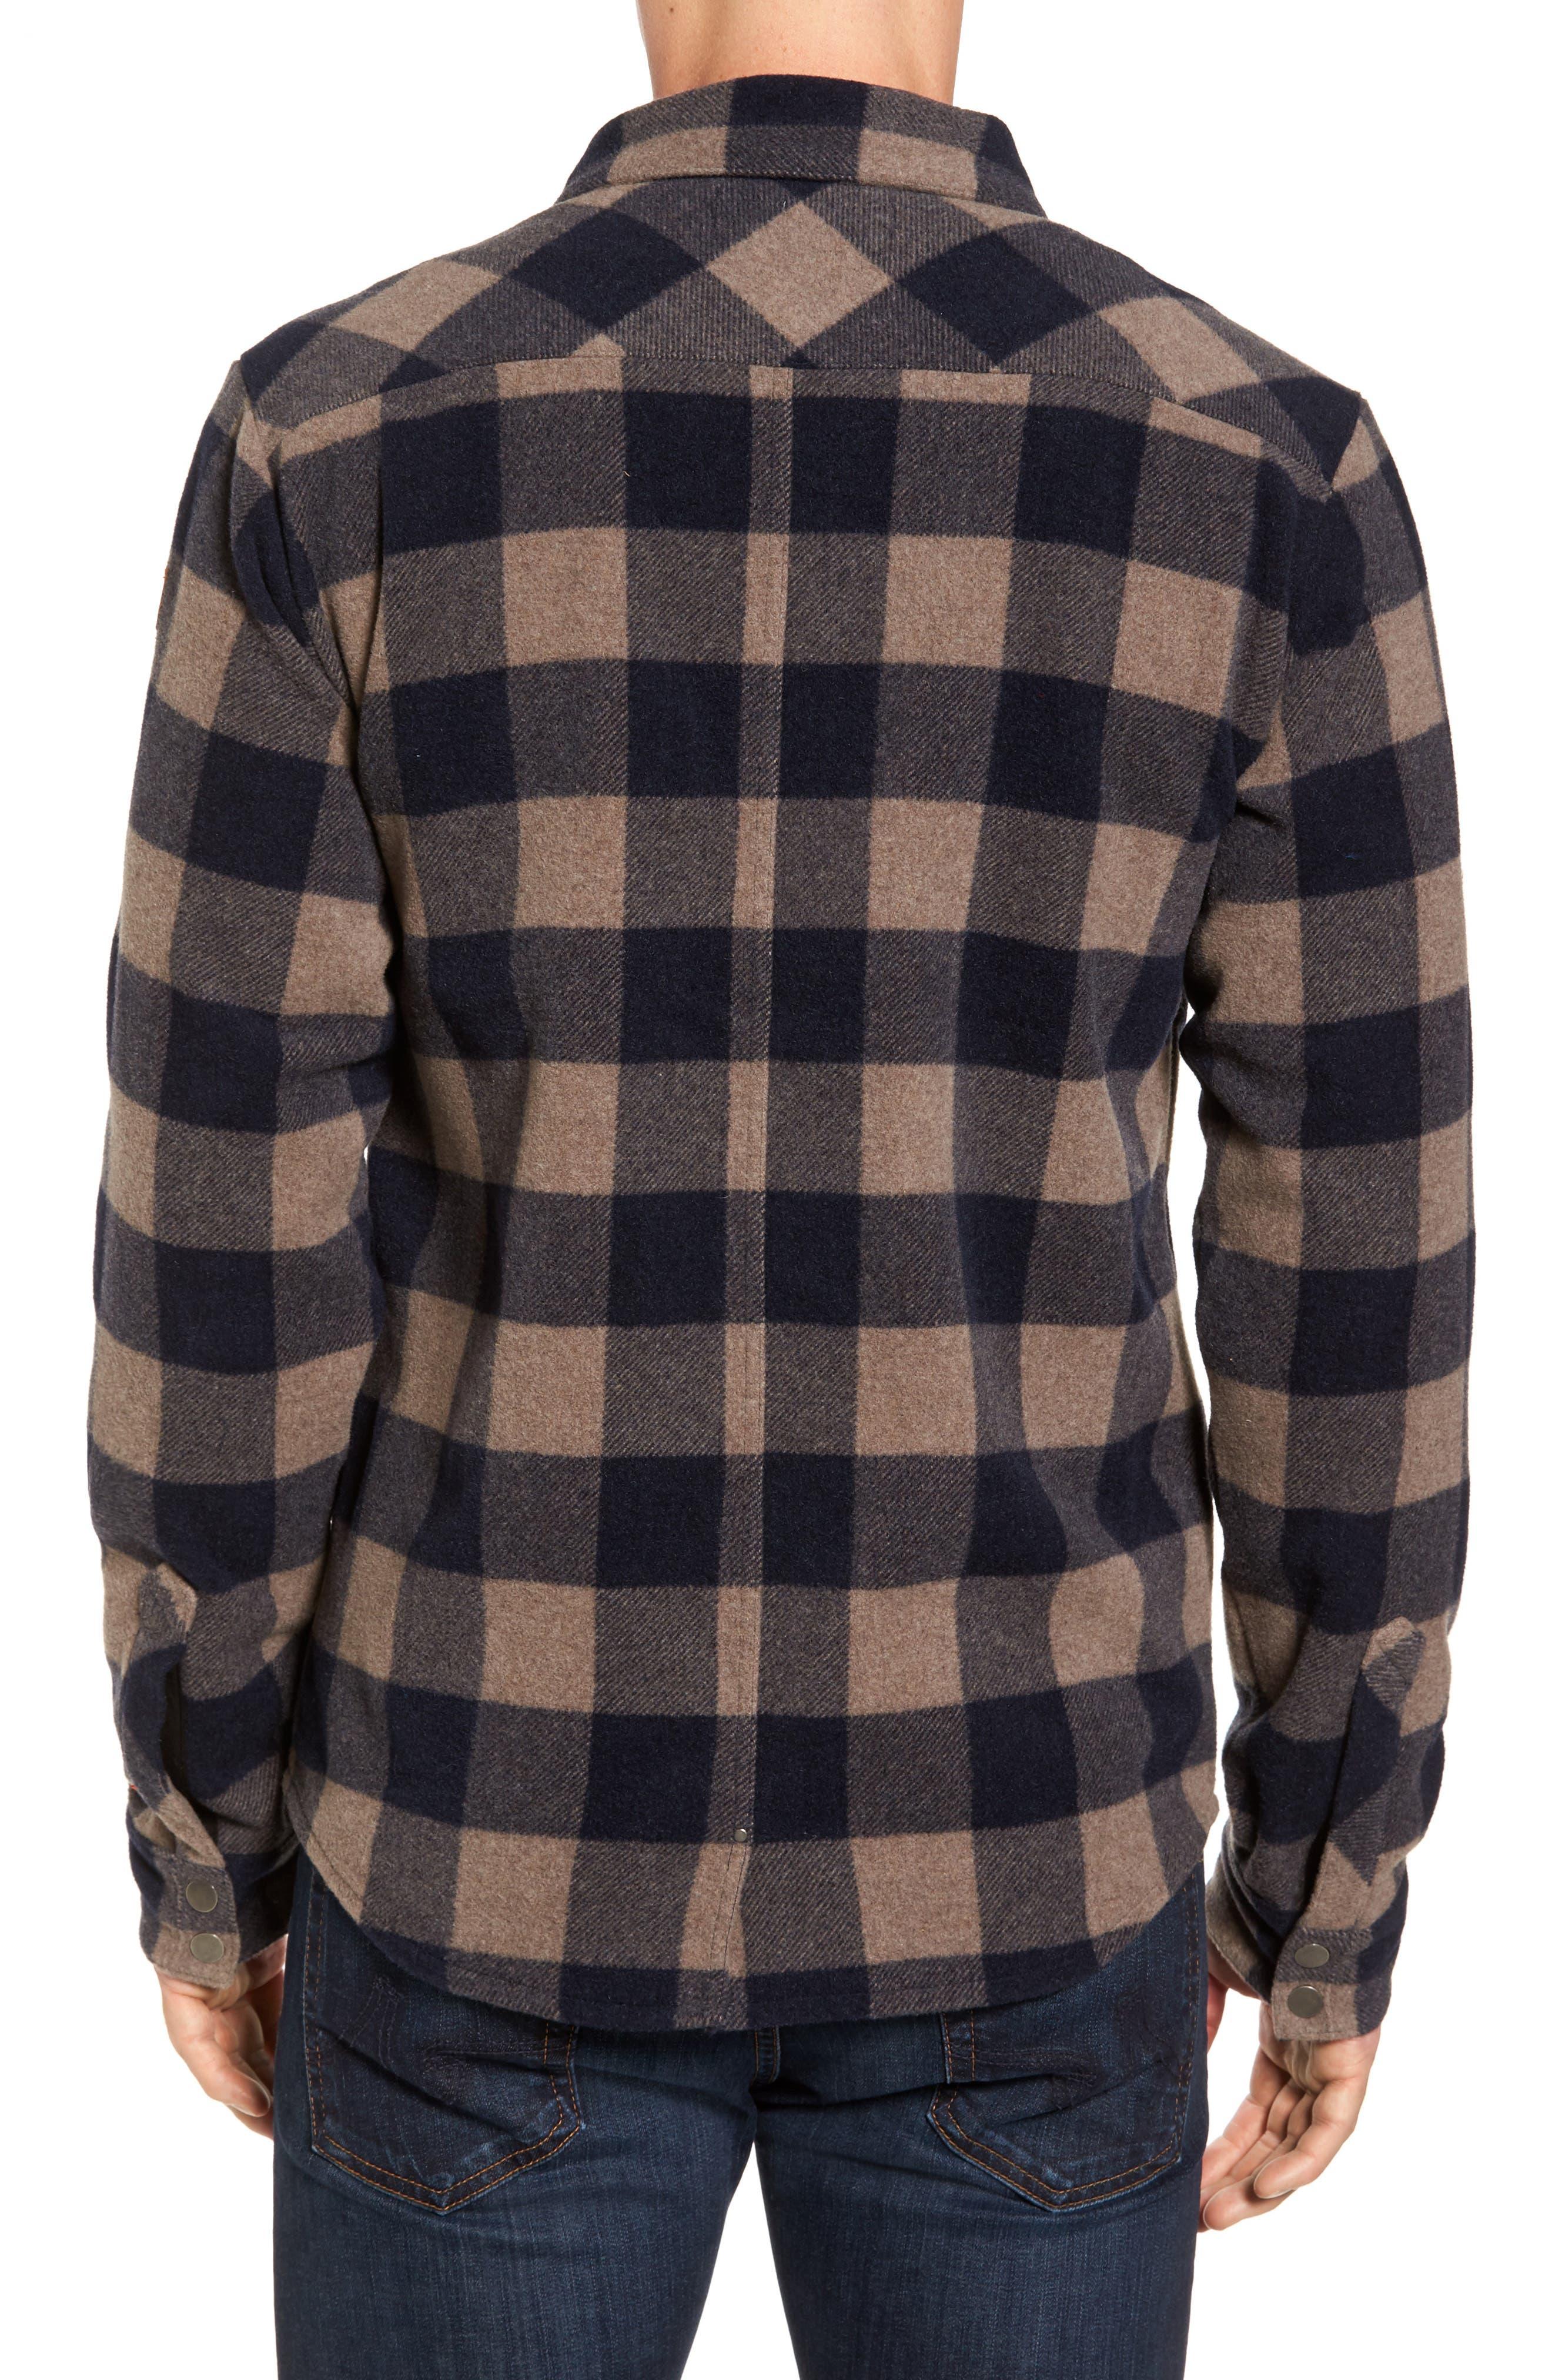 Anchor Line Flannel Shirt Jacket,                             Alternate thumbnail 2, color,                             Navy